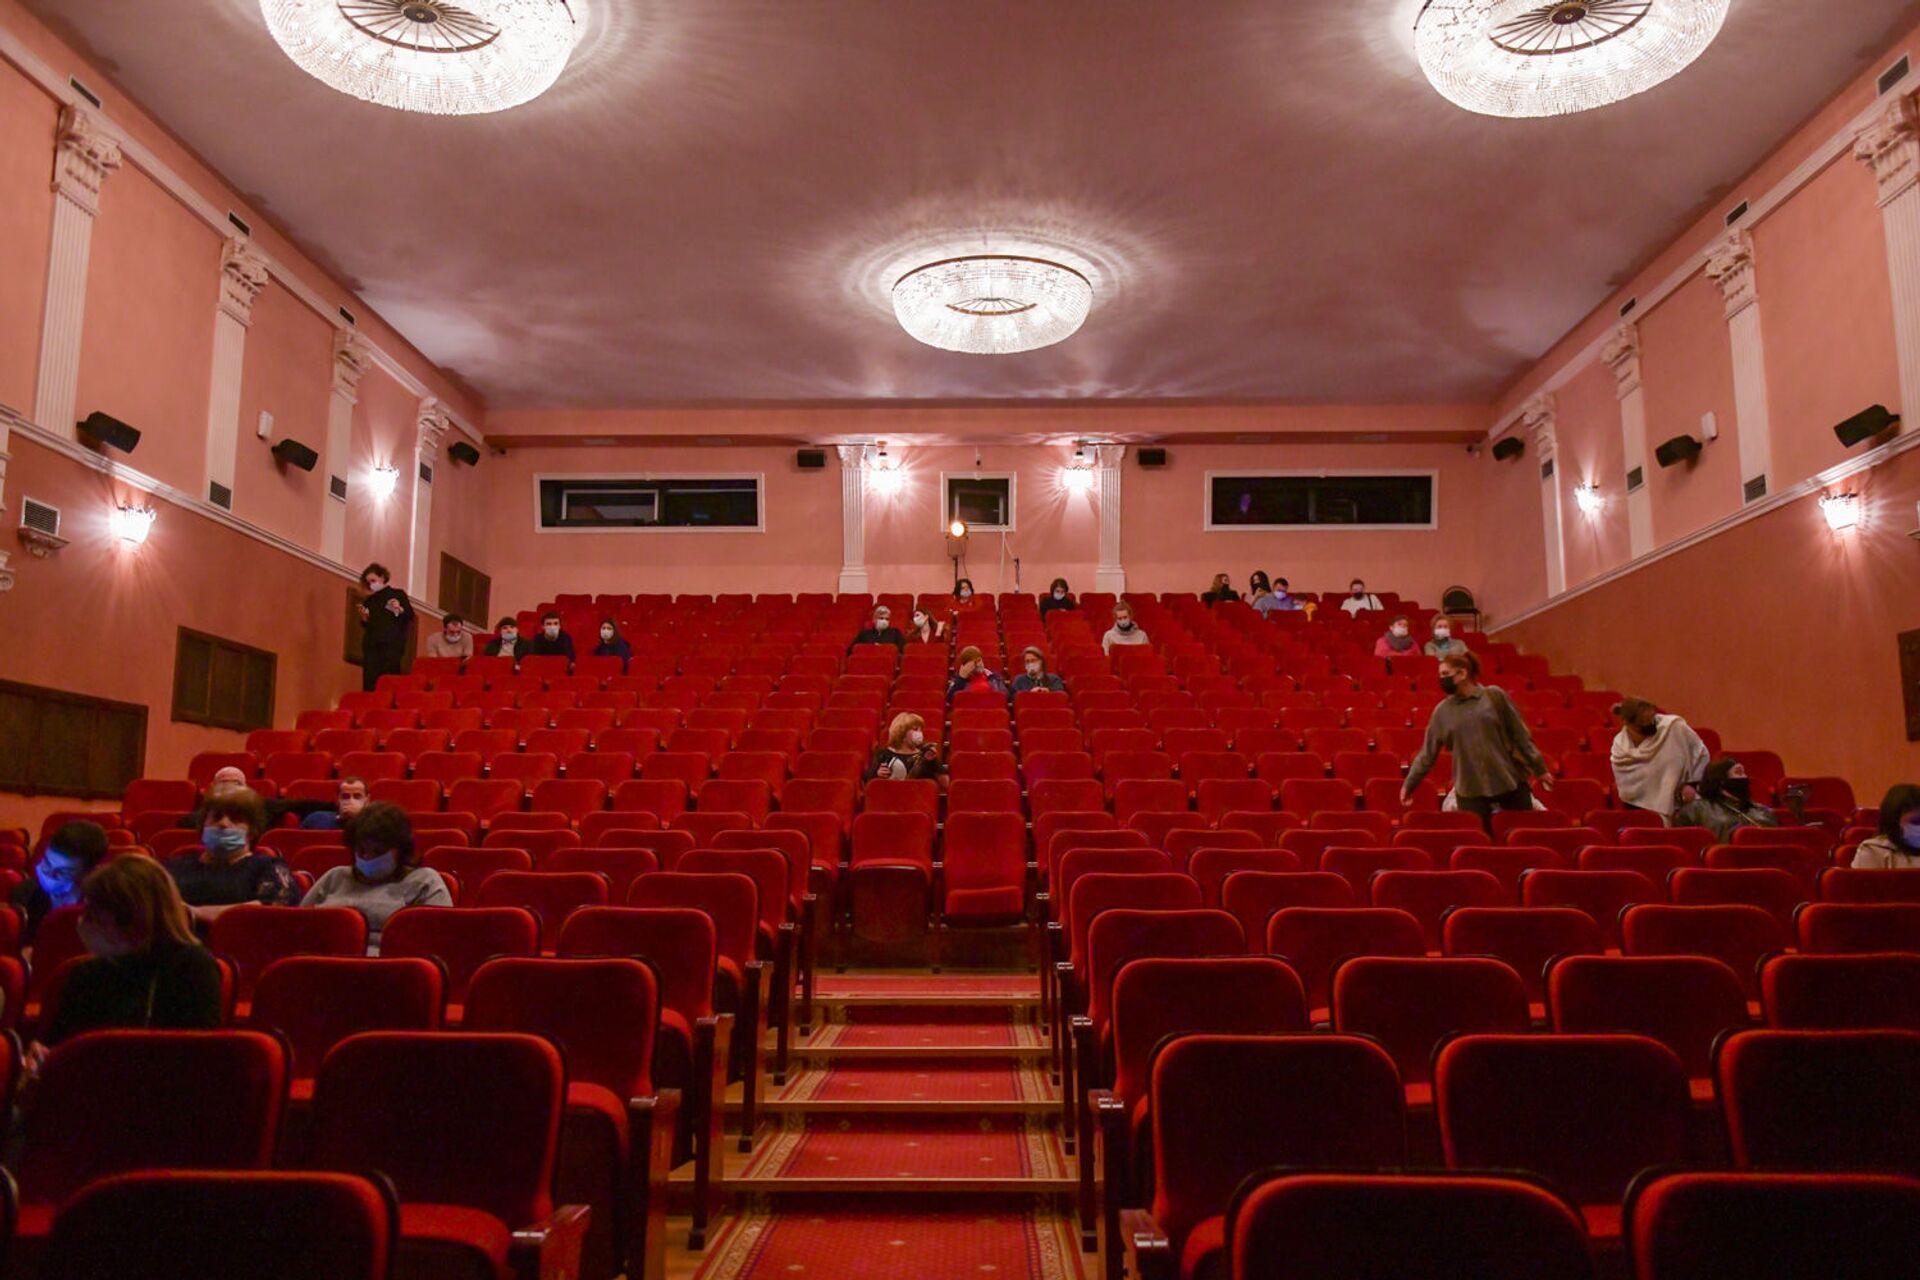 Асабрада, адистанциа, арзҩыдара: аурыс театр аусура хацнаркит - Sputnik Аҧсны, 1920, 16.02.2021